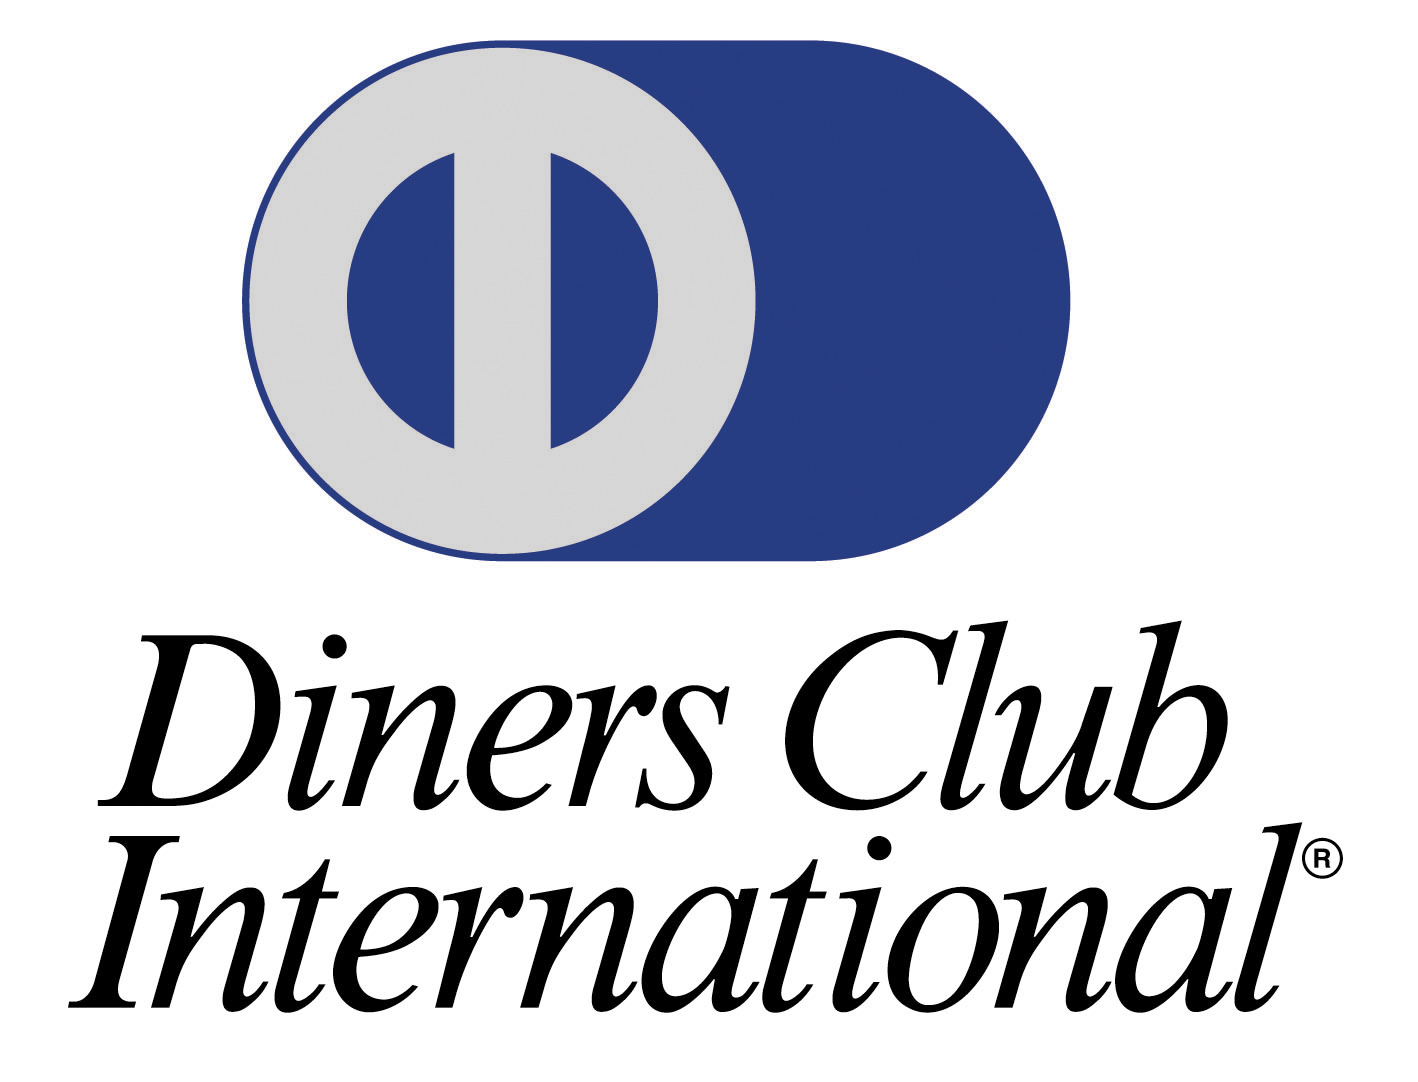 diners club internacional: